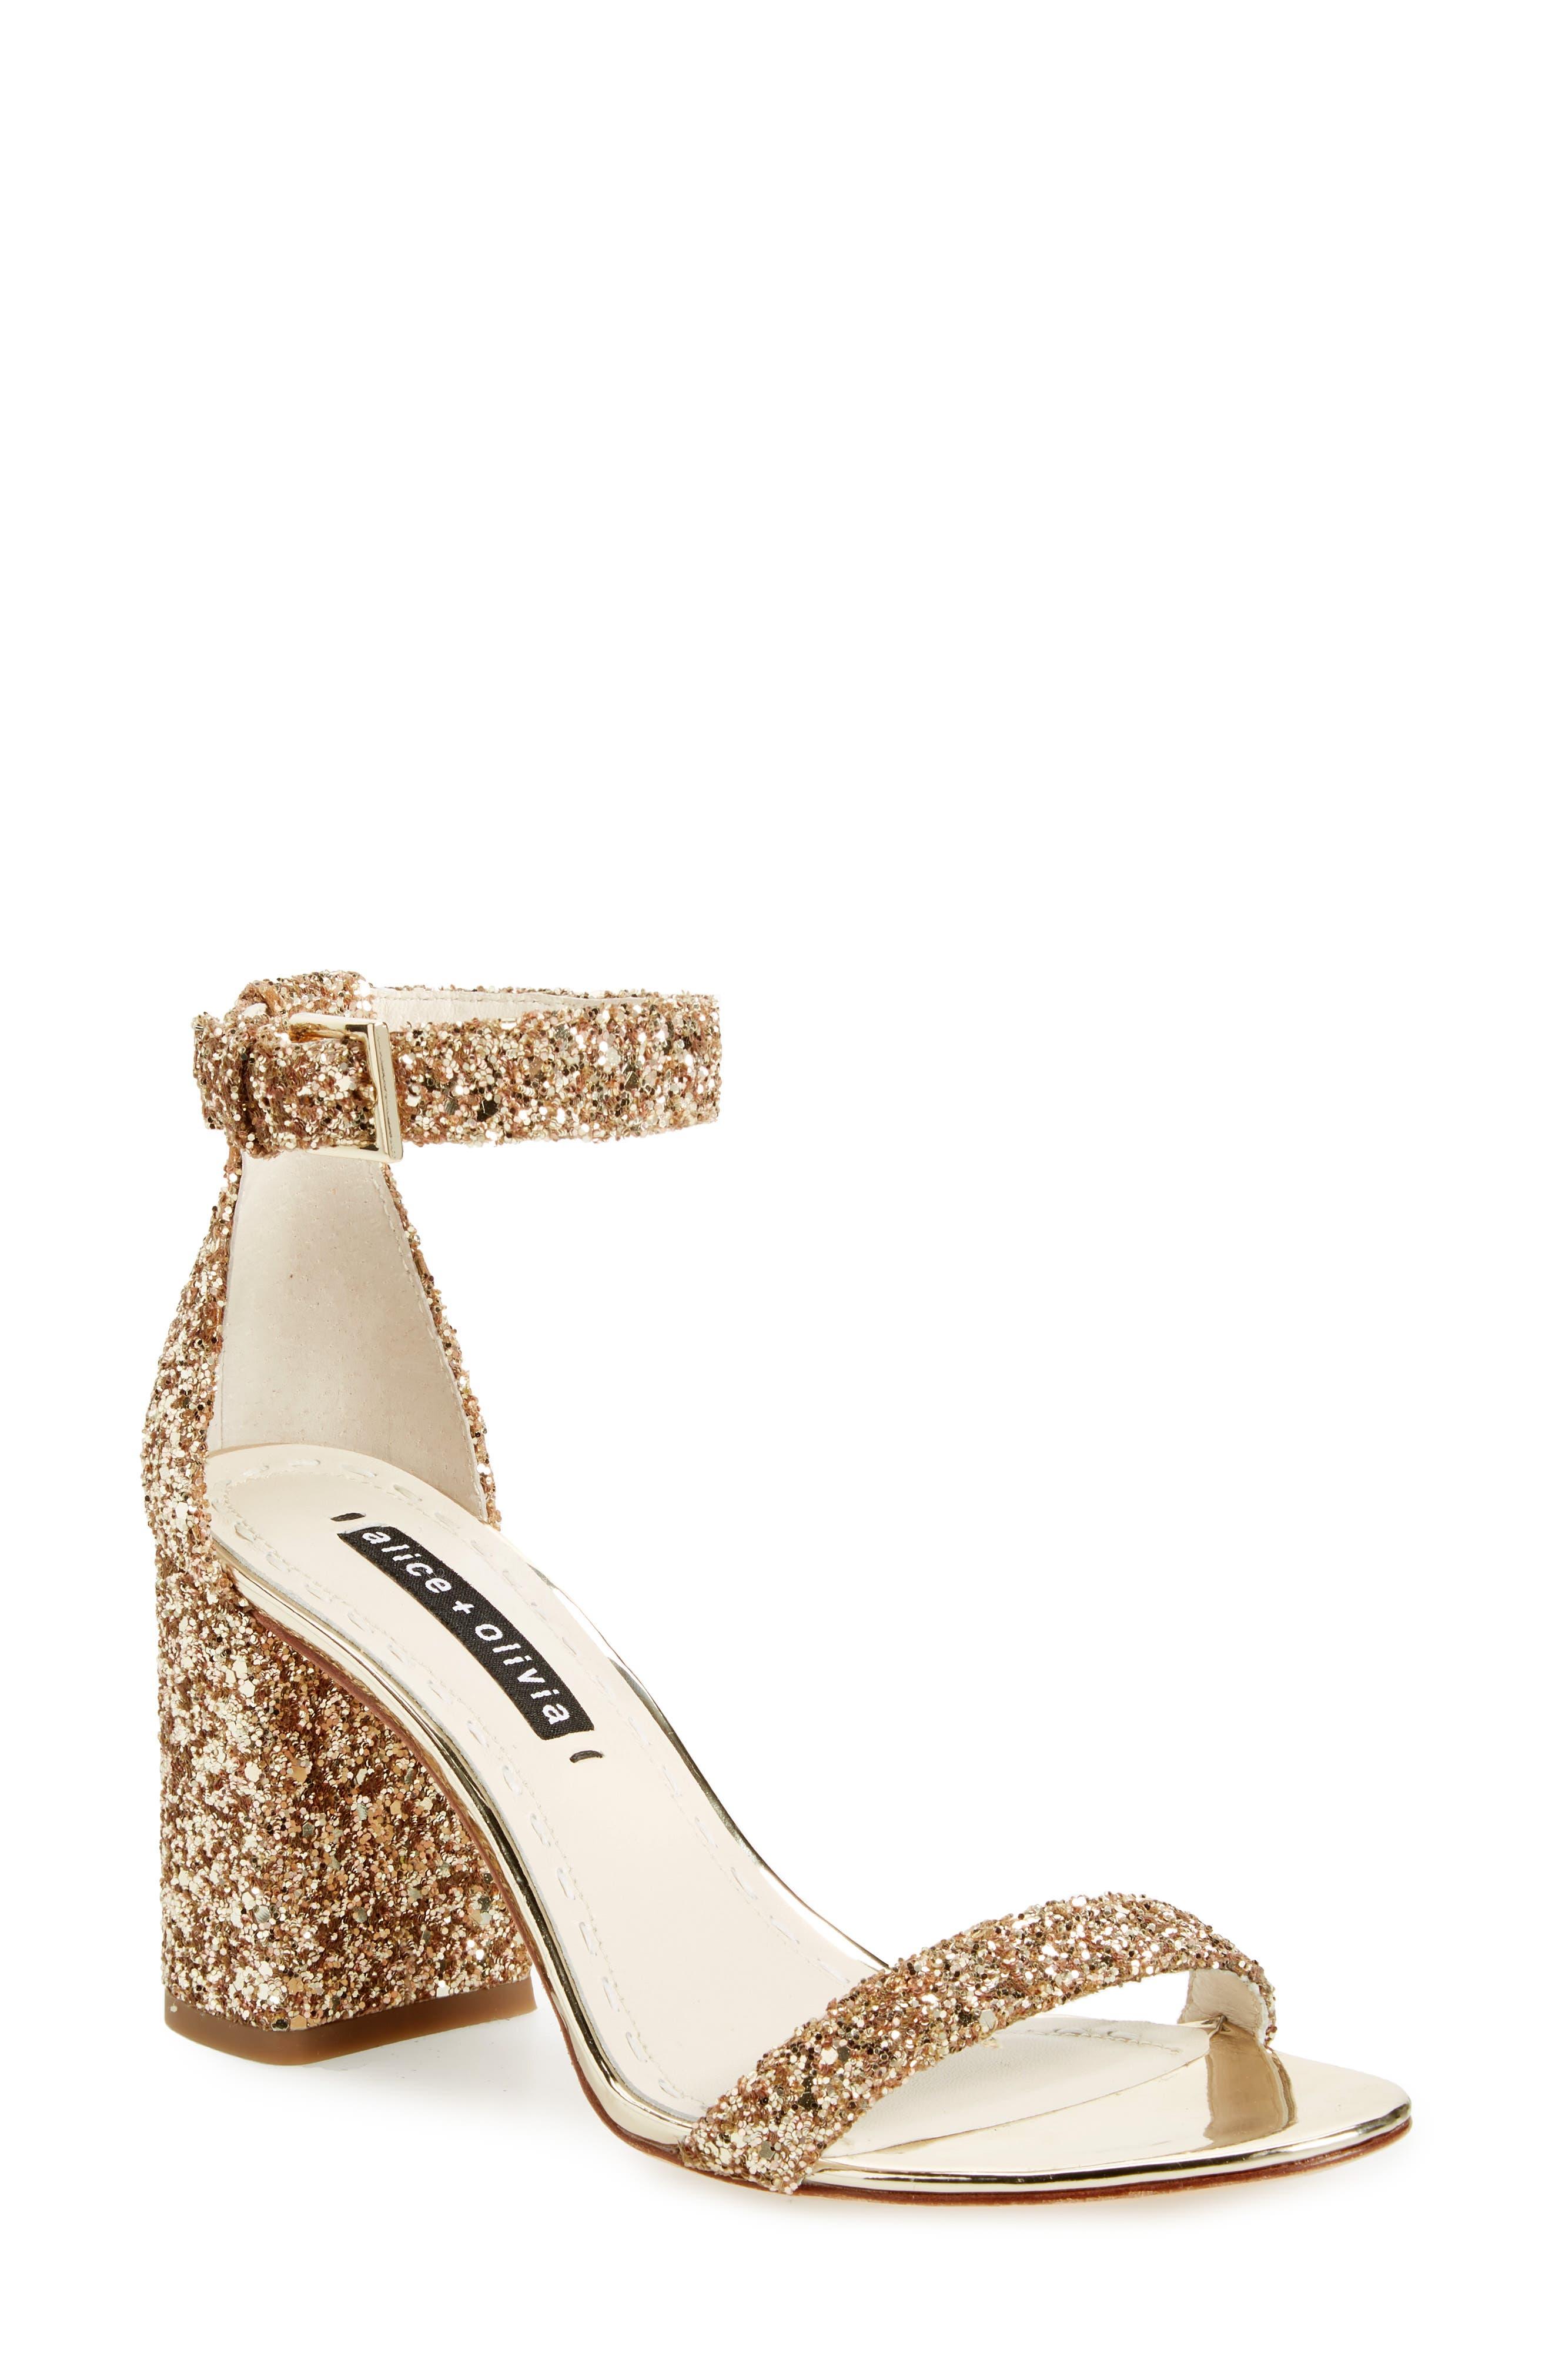 Lillian Glitter Ankle Strap Sandal,                             Main thumbnail 1, color,                             Gold